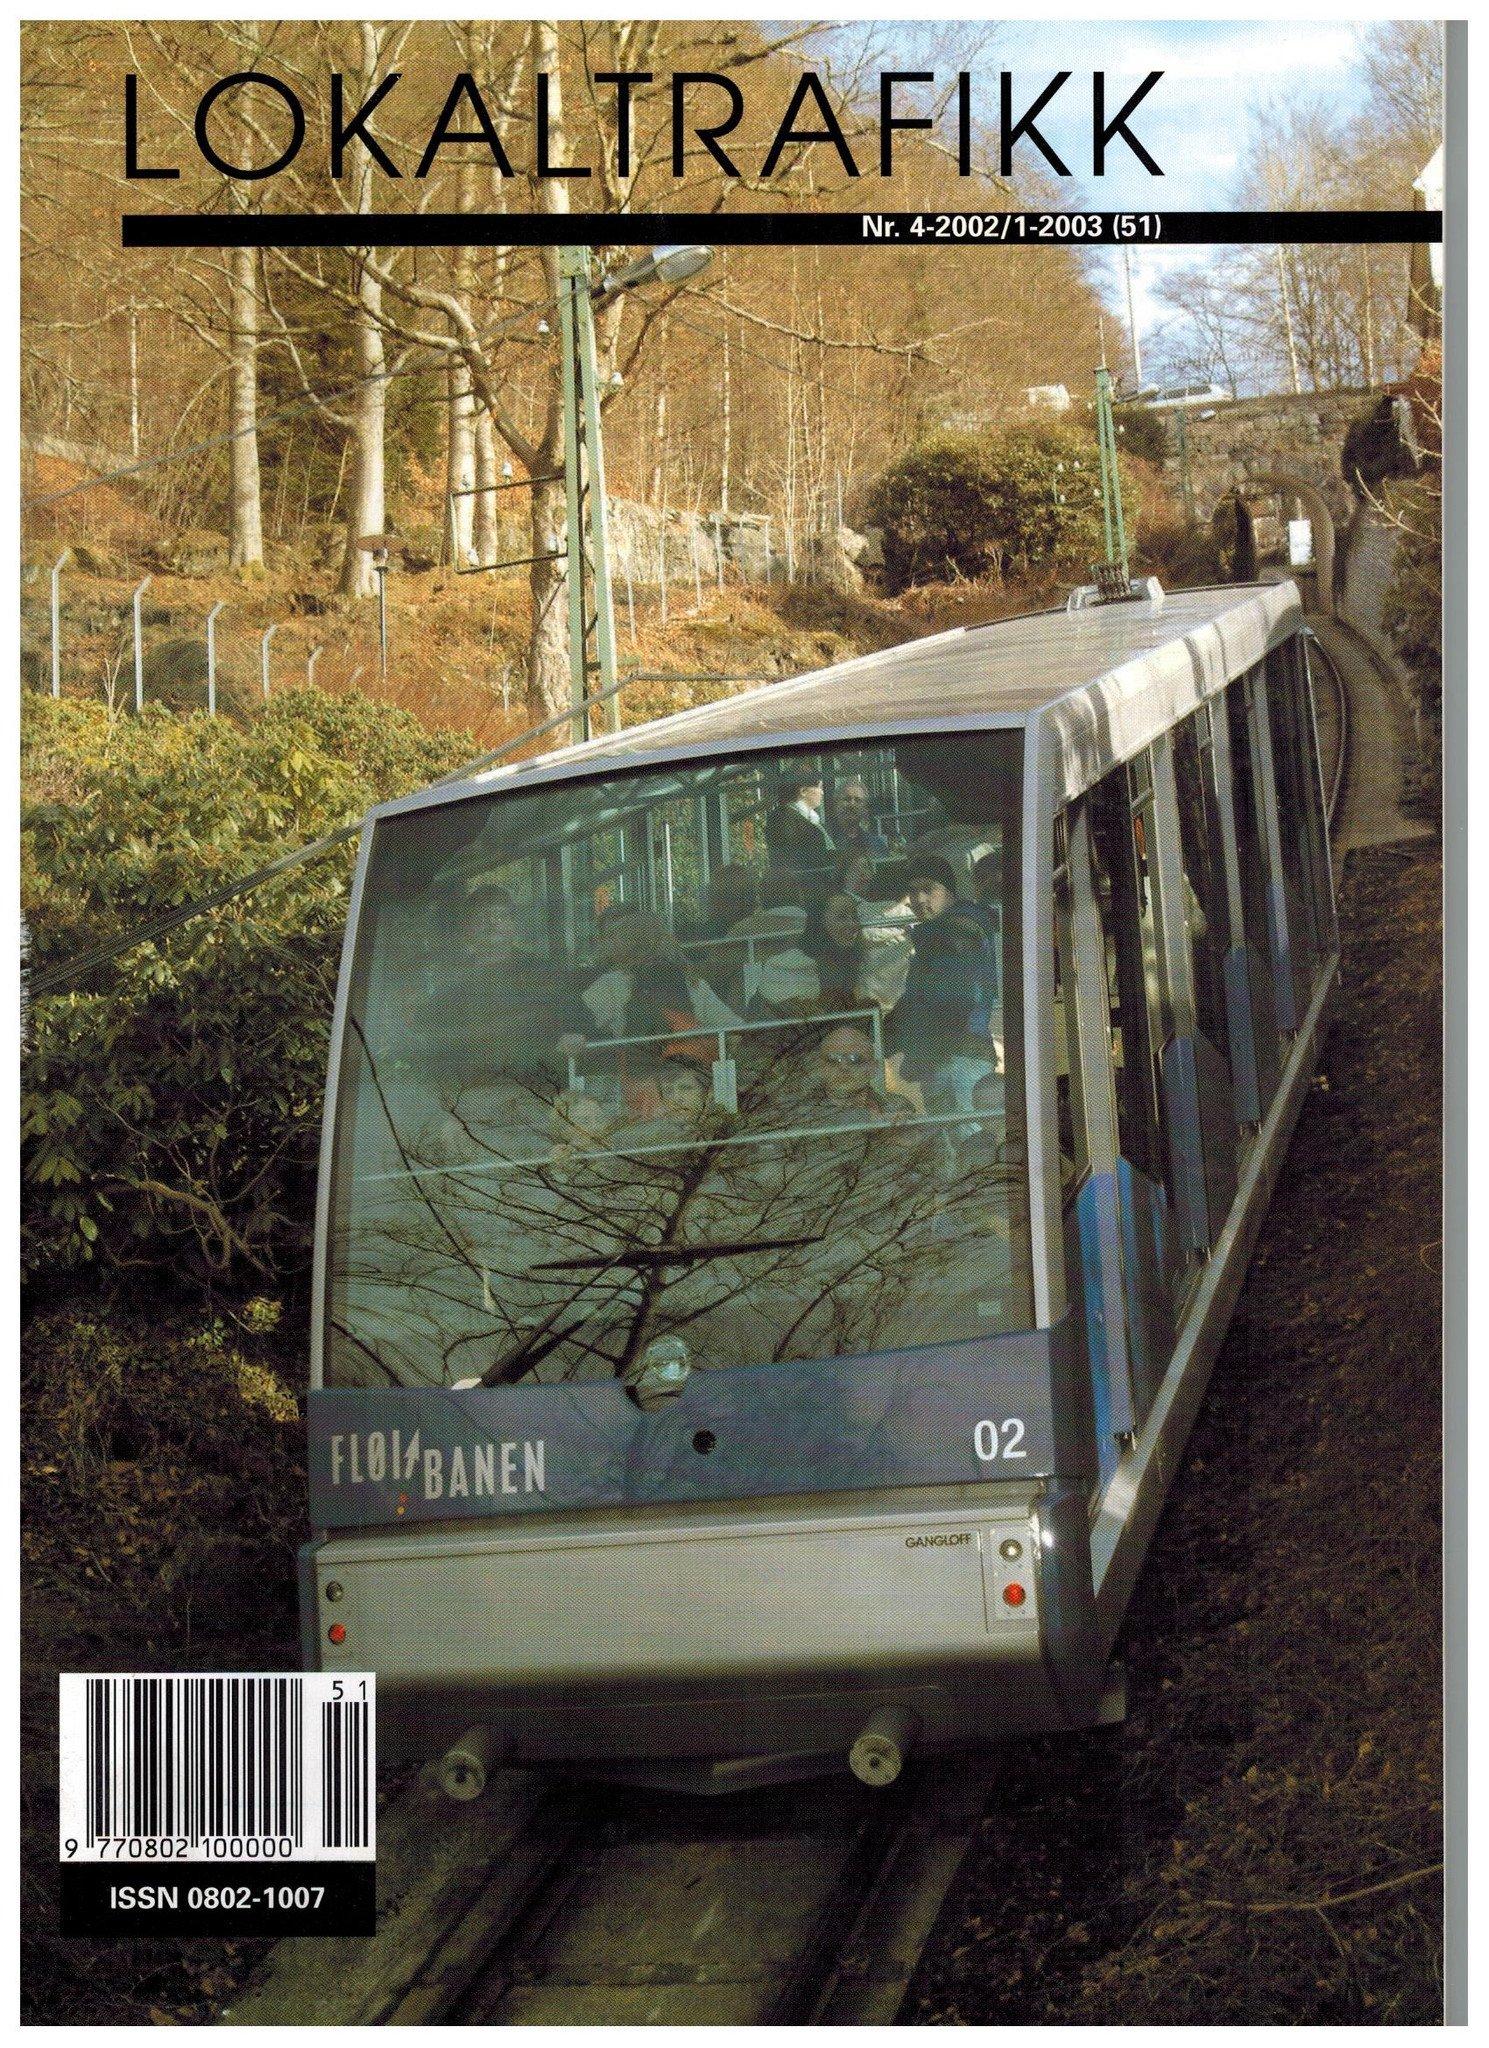 Lokaltrafikk #051